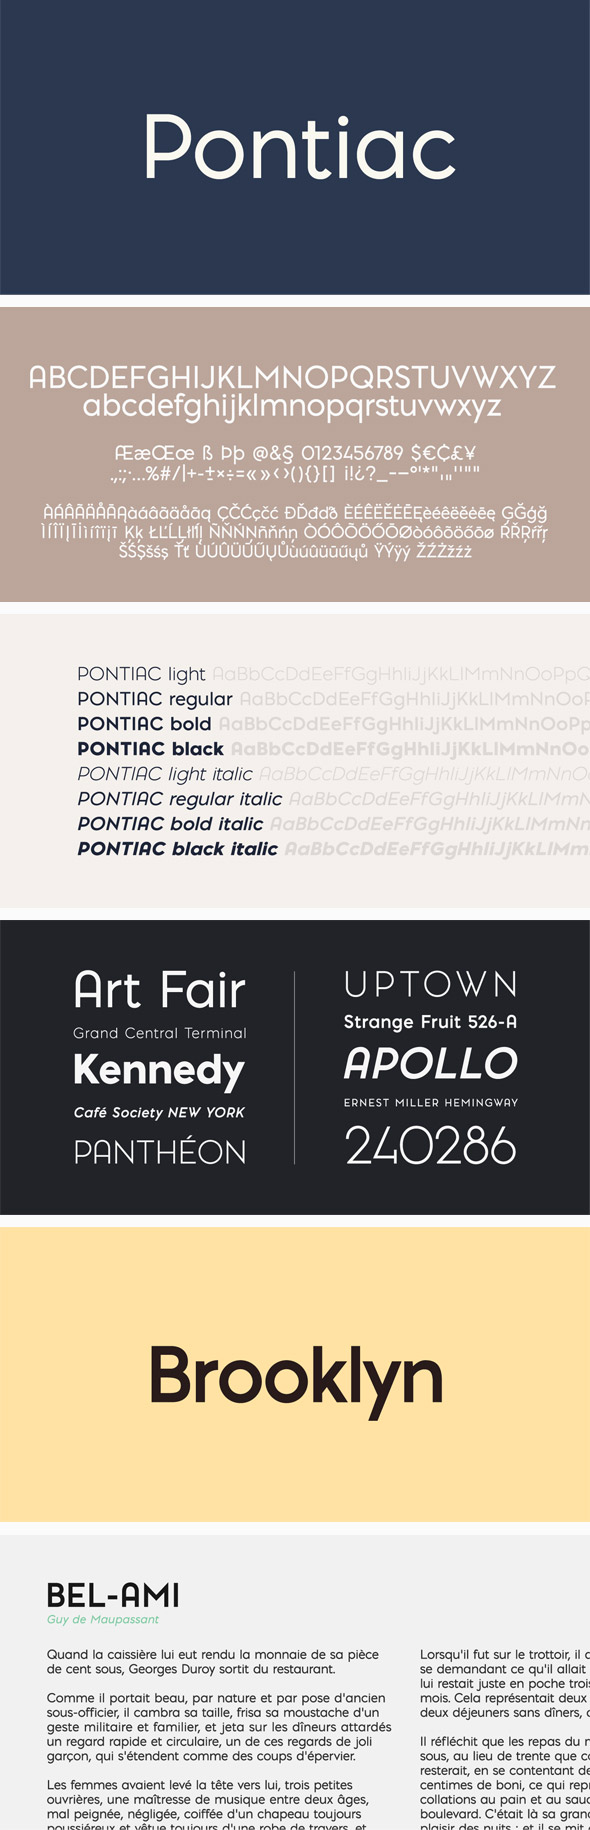 Pontiac Font Pack